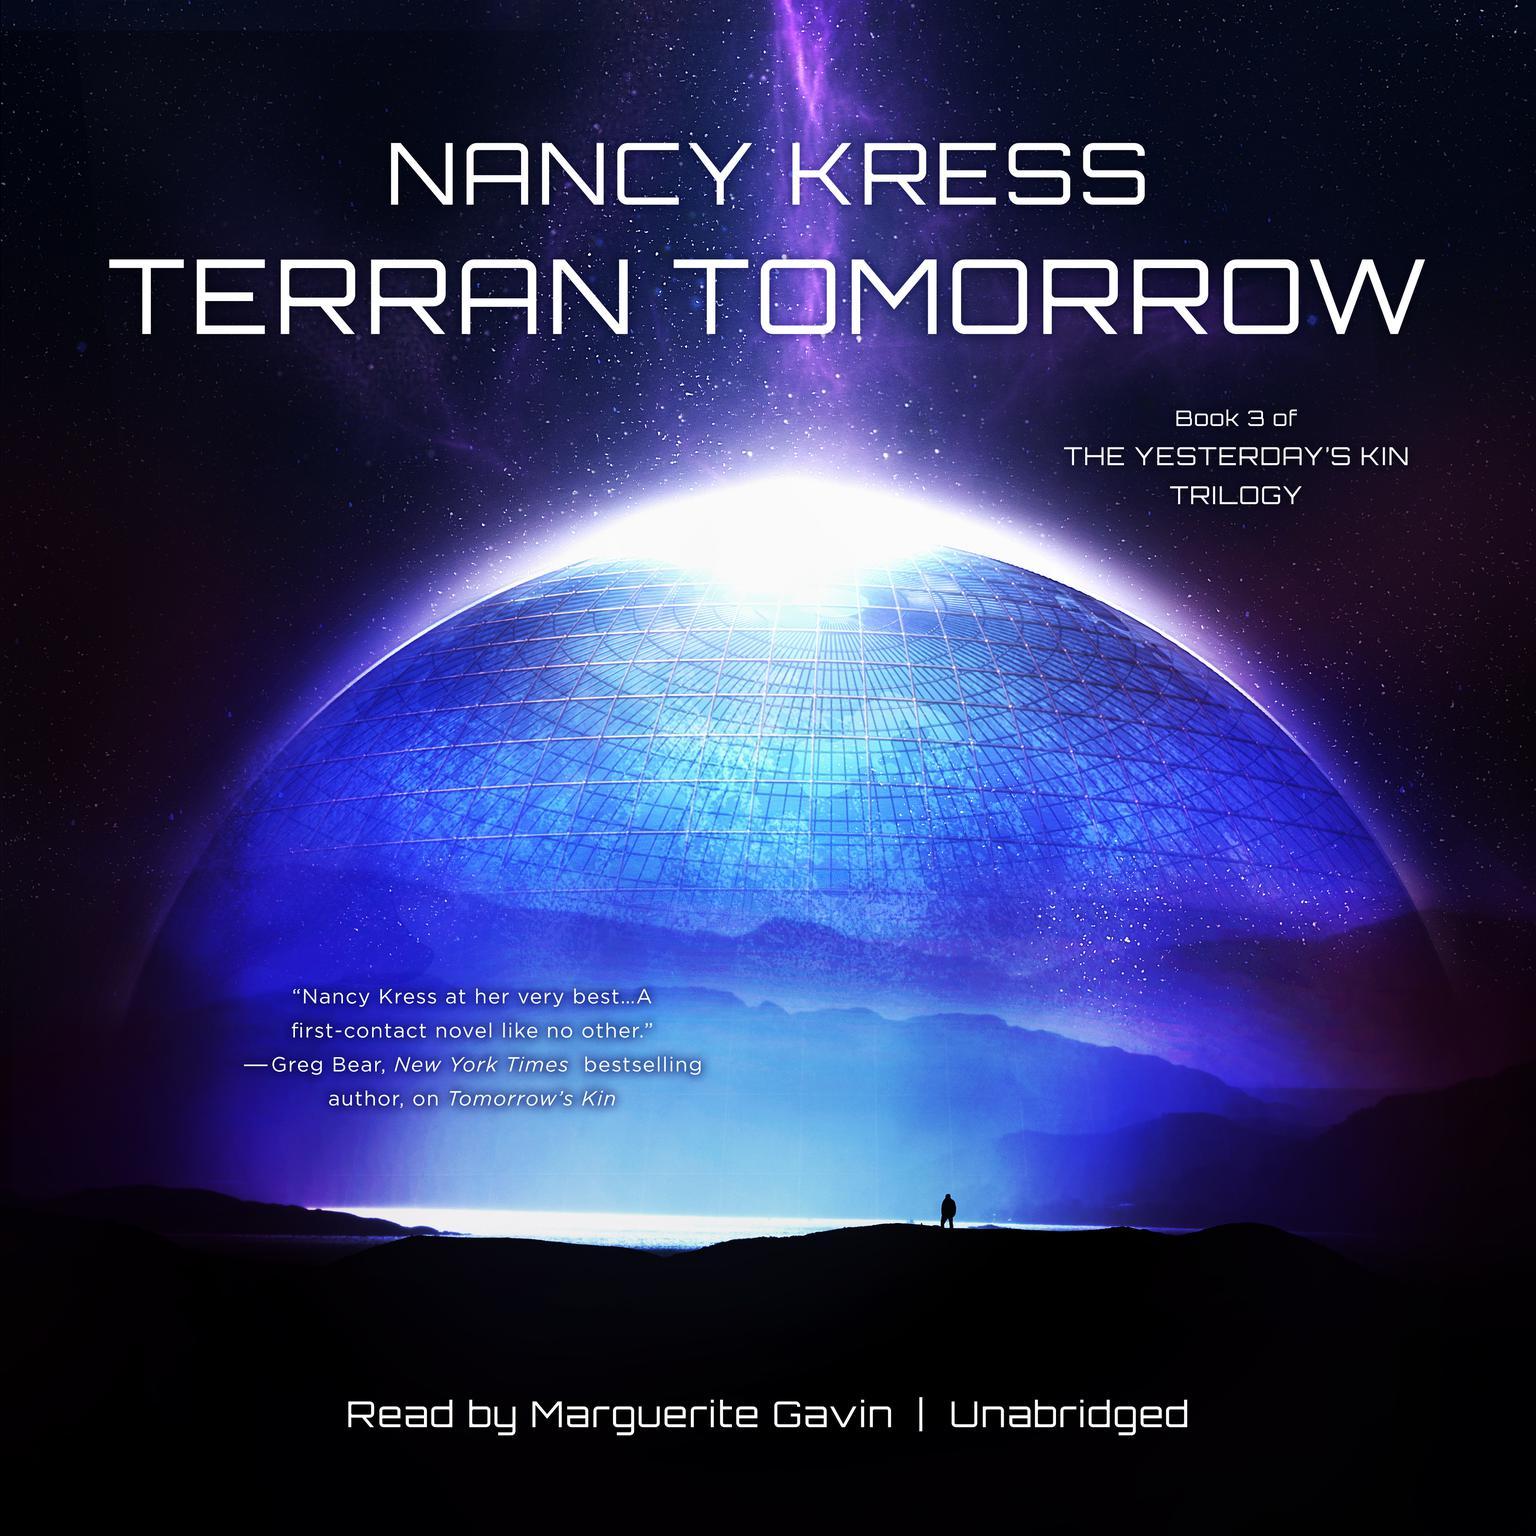 Terran Tomorrow: Book 3 of the Yesterday's Kin Trilogy Audiobook, by Nancy Kress